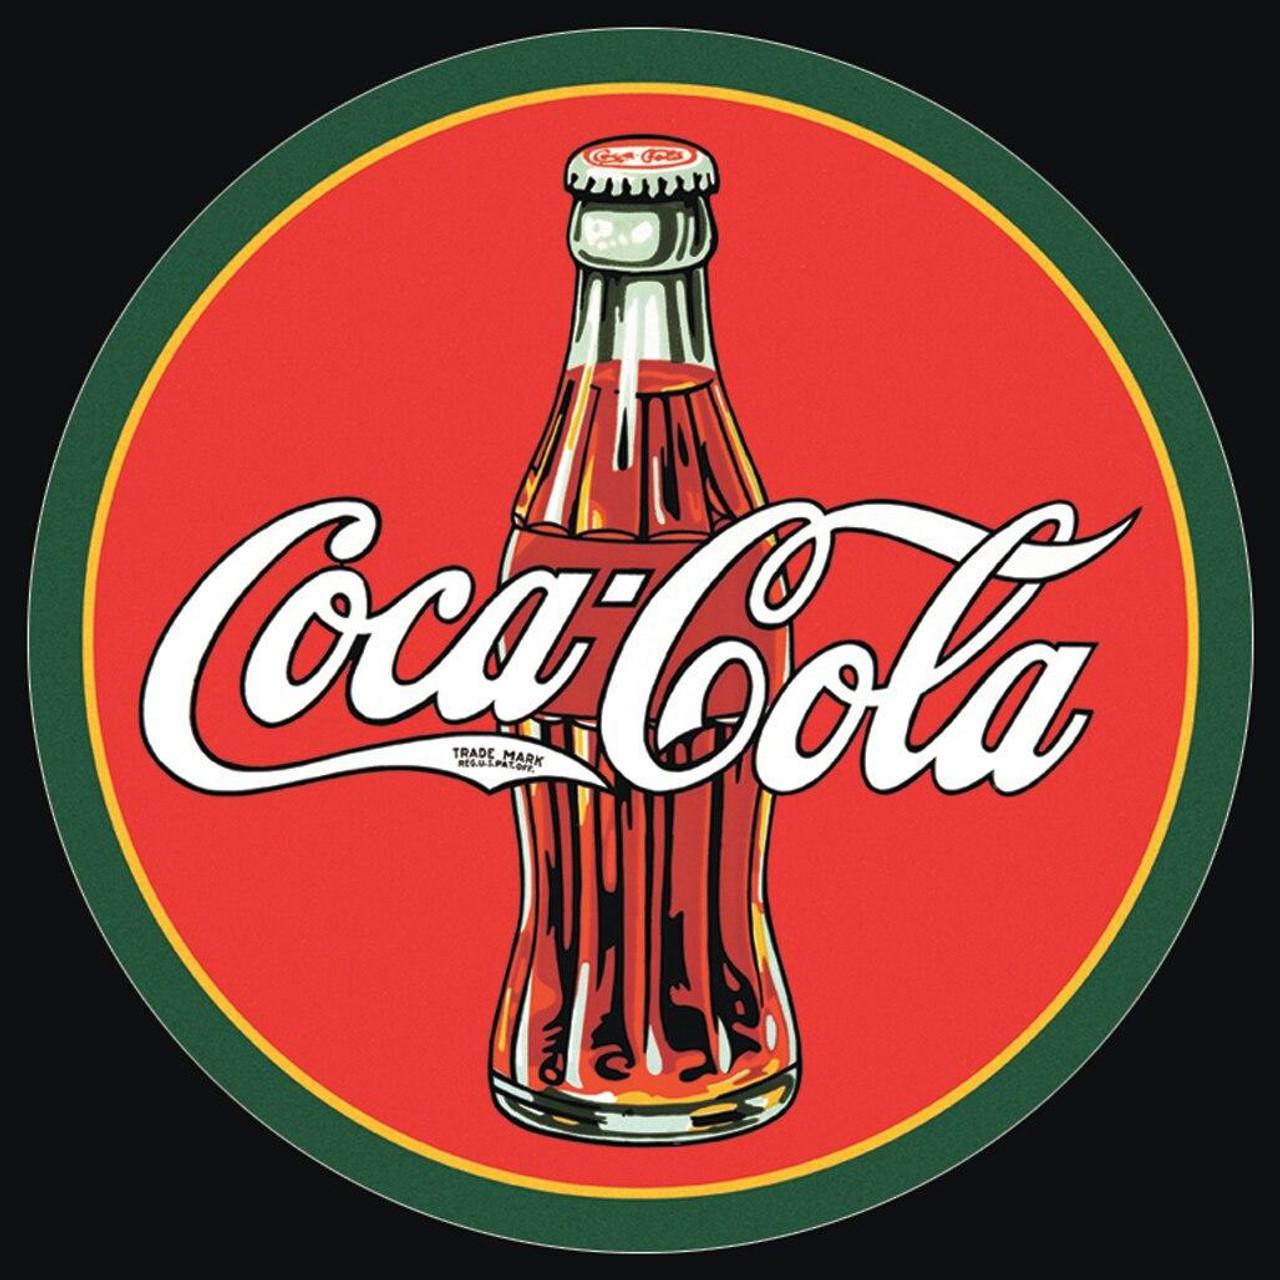 Coca-Cola COKE - Round 30s Bottle and Log